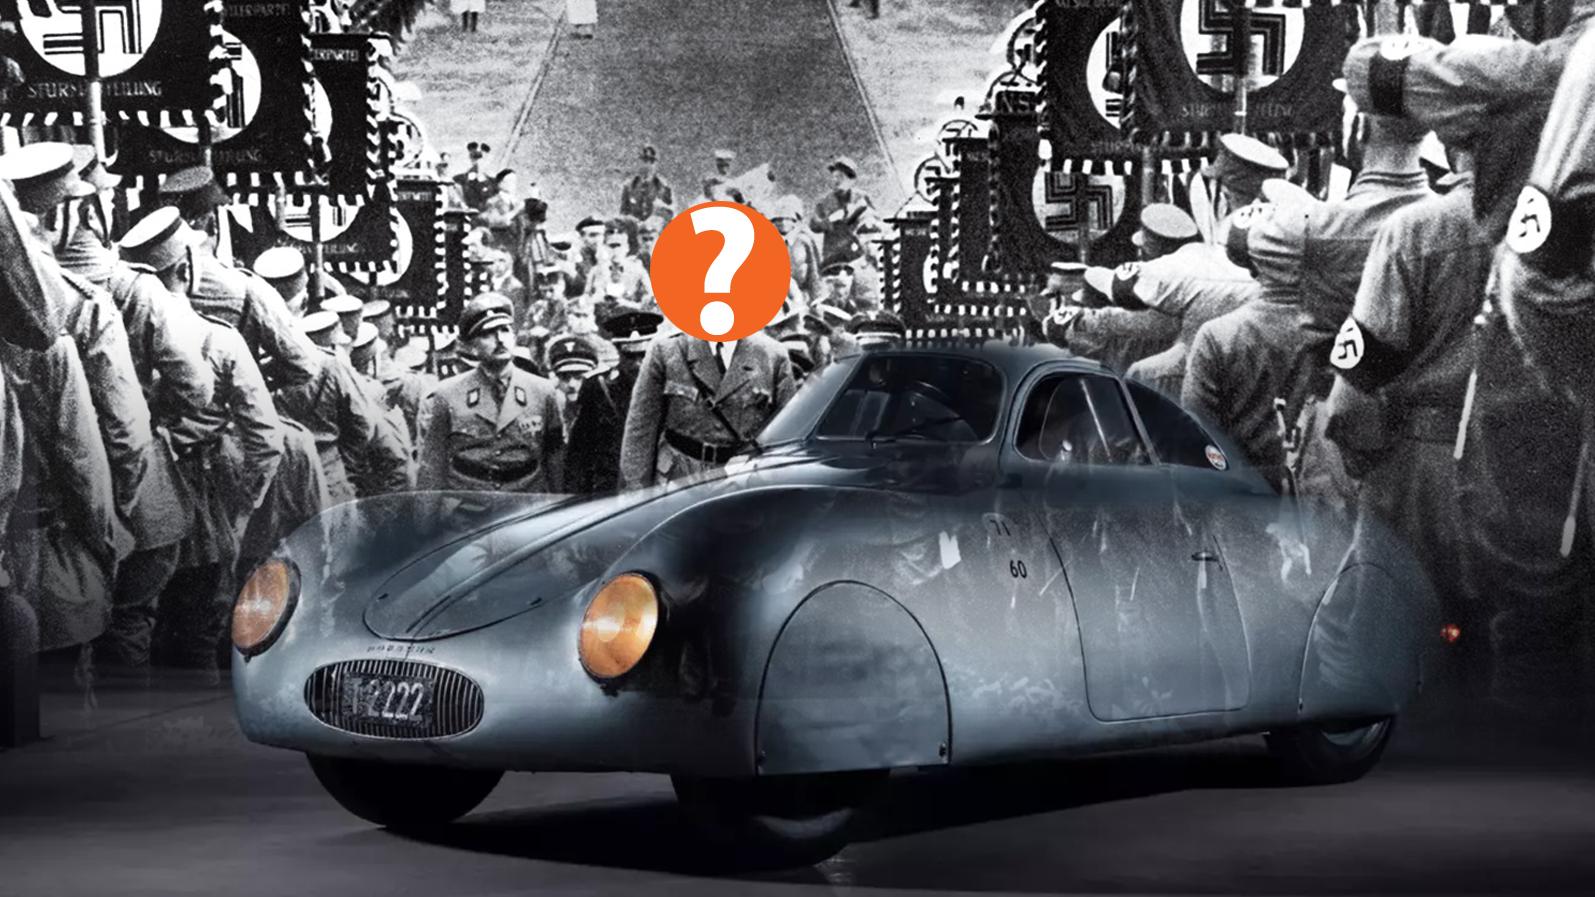 Should The Porsche-Designed Type 64 Racer Be Considered Nazi Memorabilia?